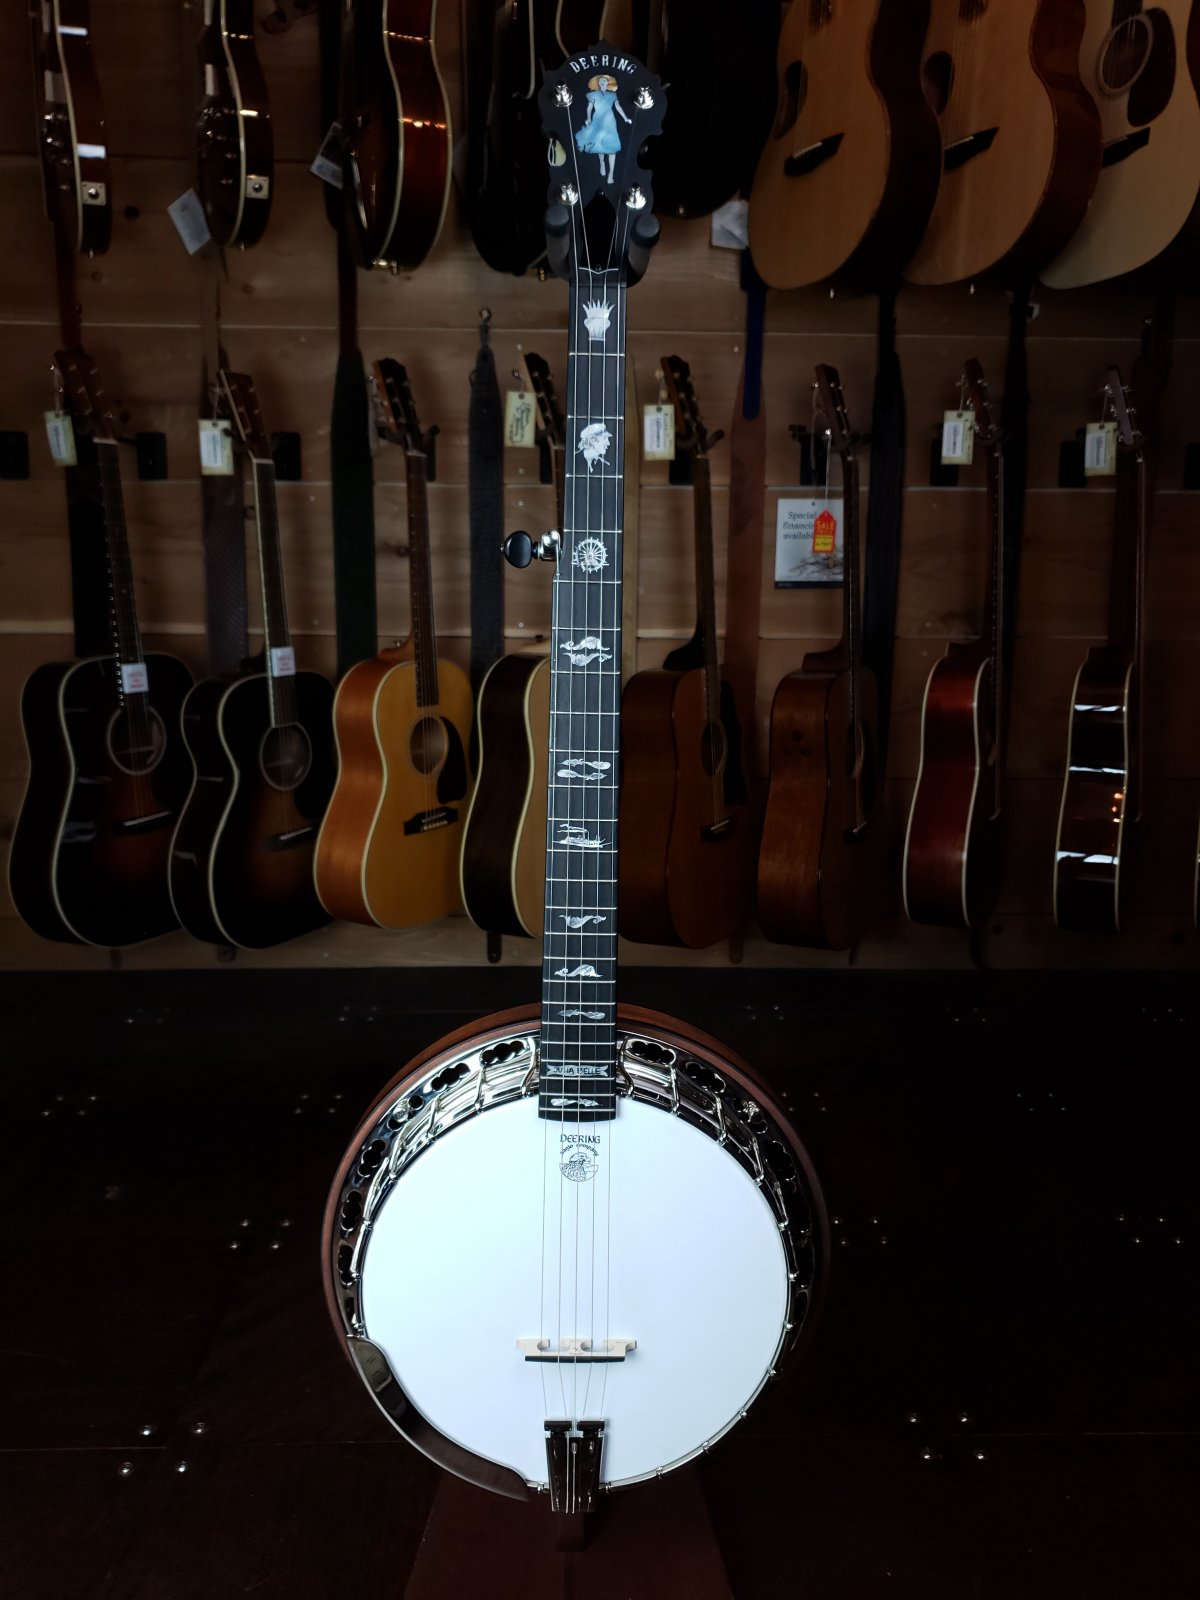 Deering Julia Belle 5-String Banjo #0018